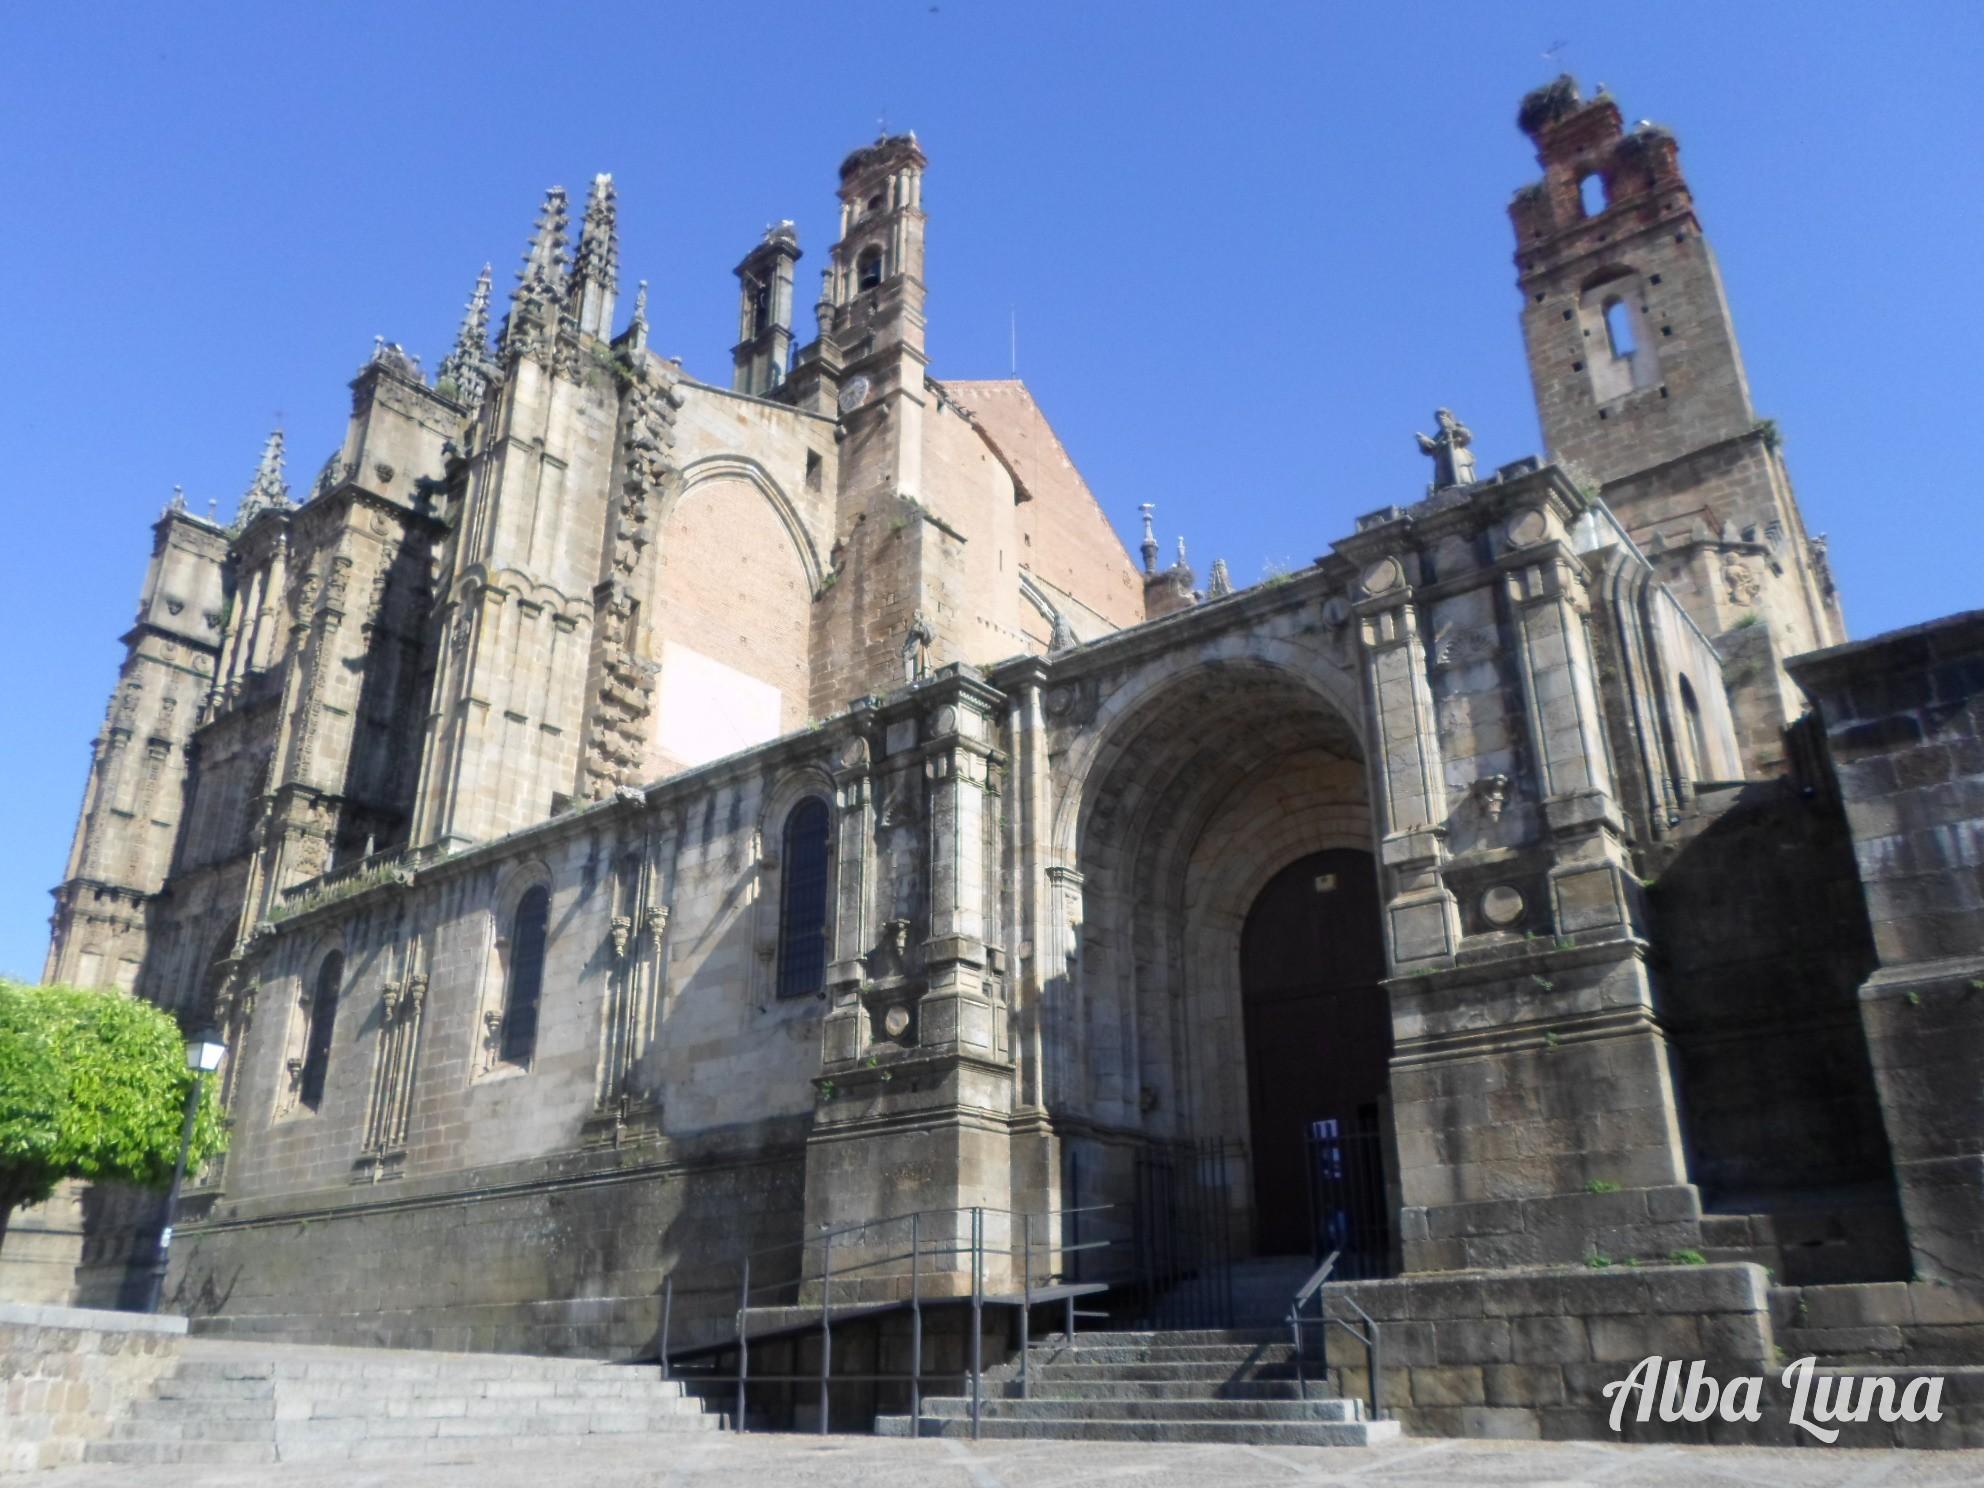 La Catedral Vieja y la Nueva, solapadas.